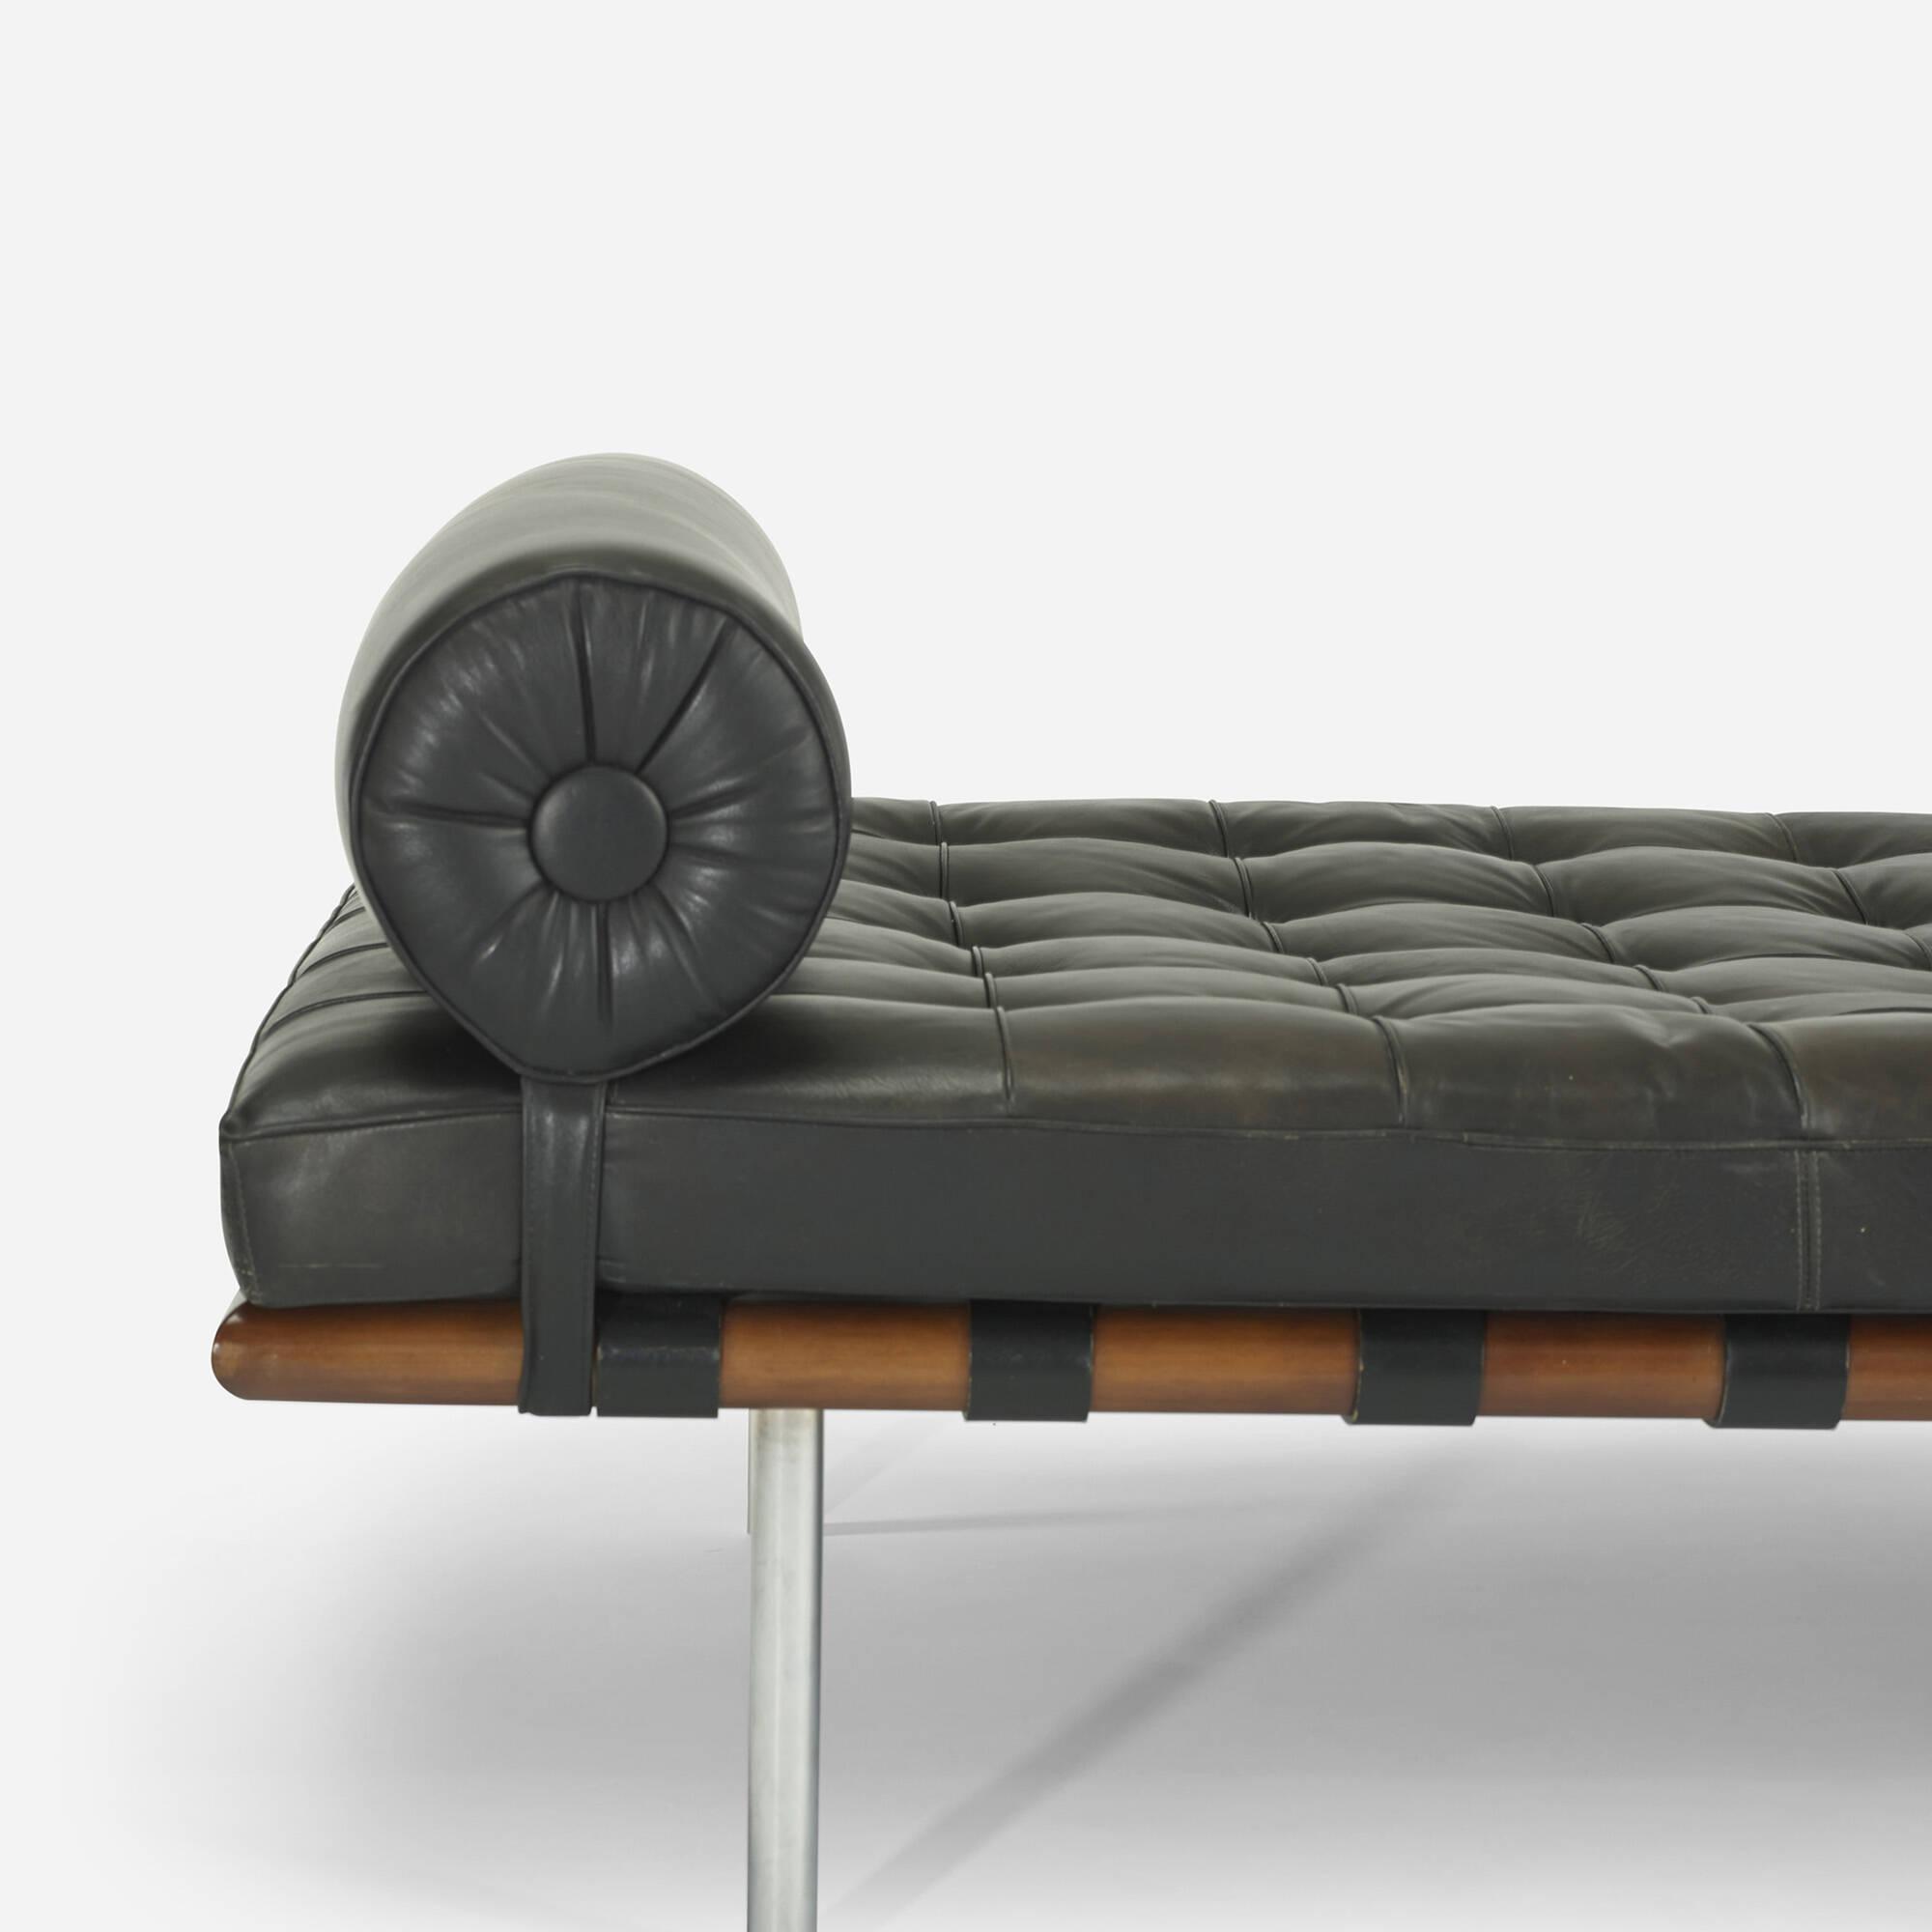 barcelona chaise longue finest pavilion barcelona chair mies van der rohe with barcelona chaise. Black Bedroom Furniture Sets. Home Design Ideas